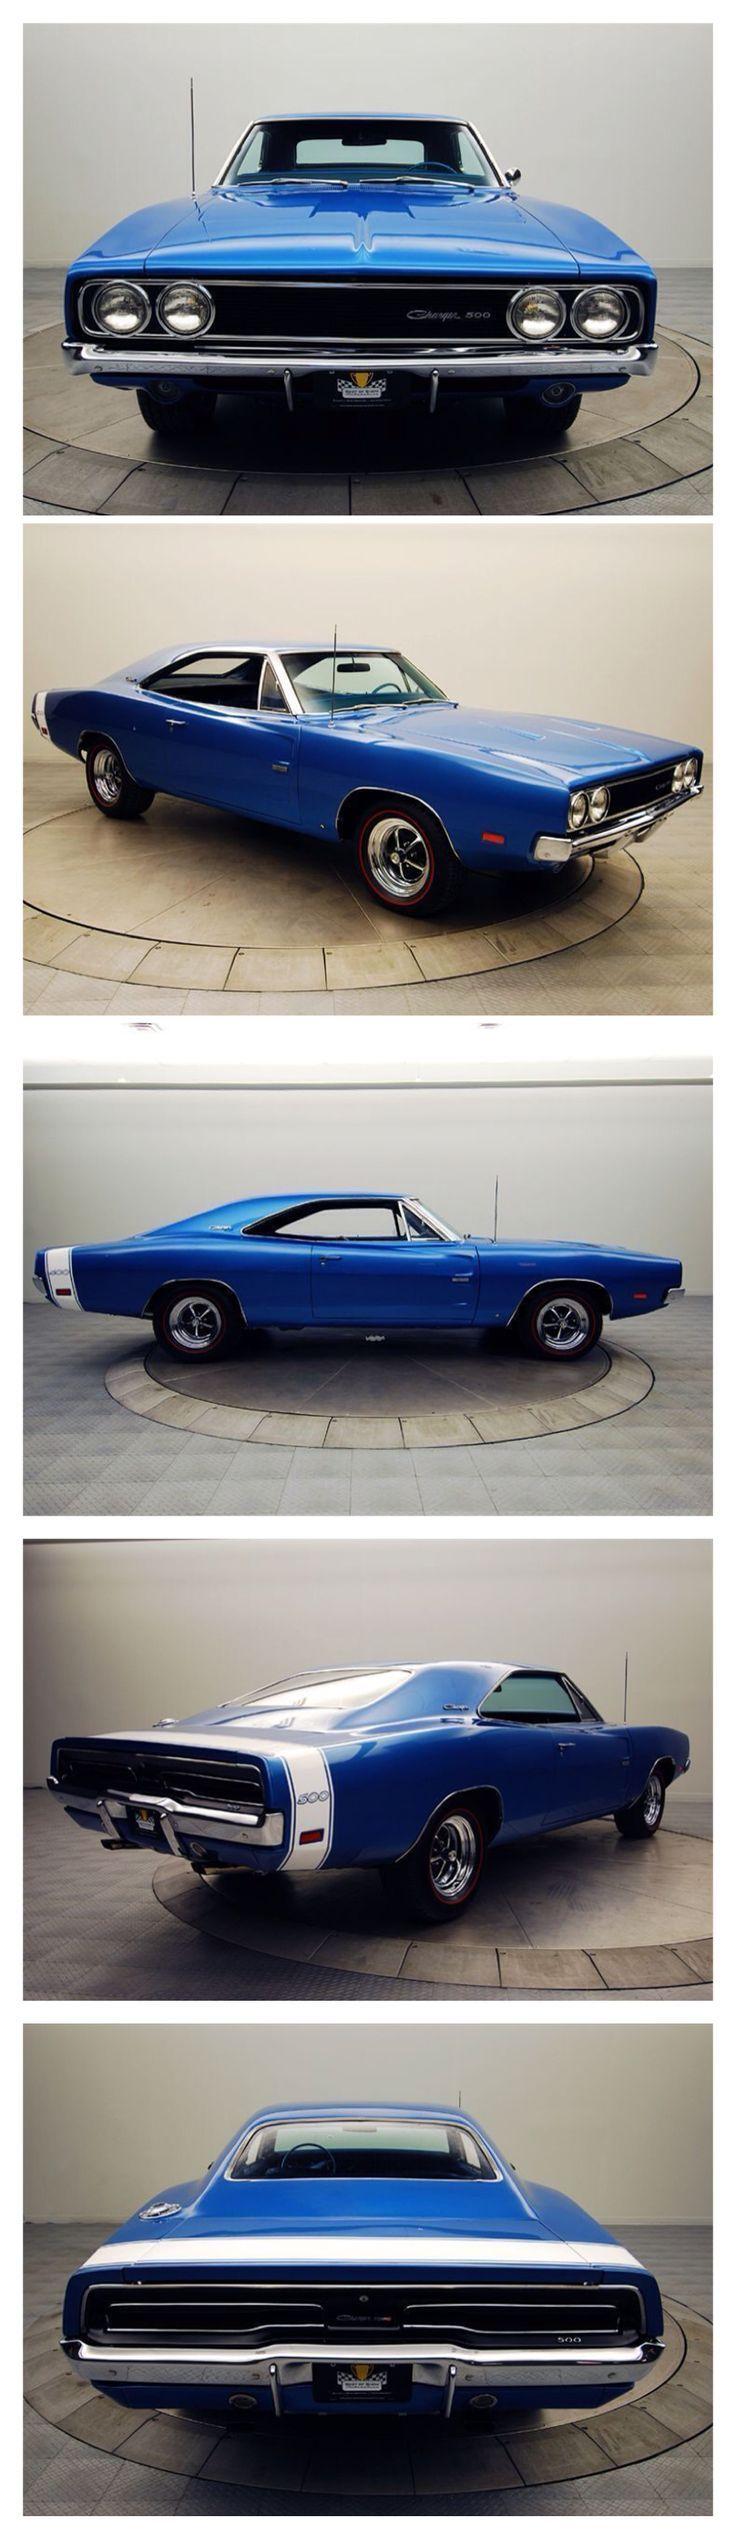 1050 best images about autos on pinterest mk1 porsche 911 and porsche carrera. Black Bedroom Furniture Sets. Home Design Ideas